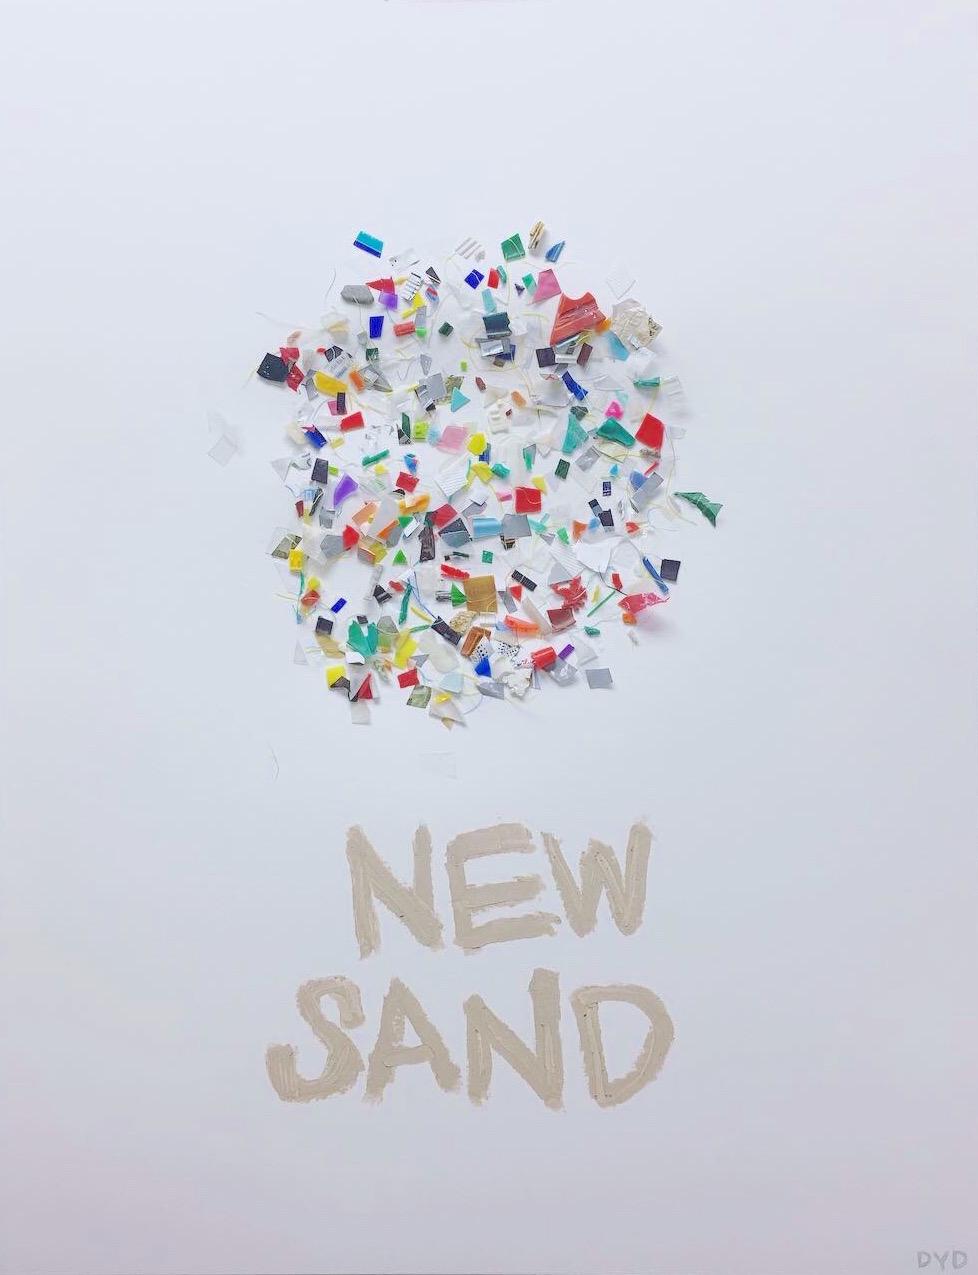 New Sand